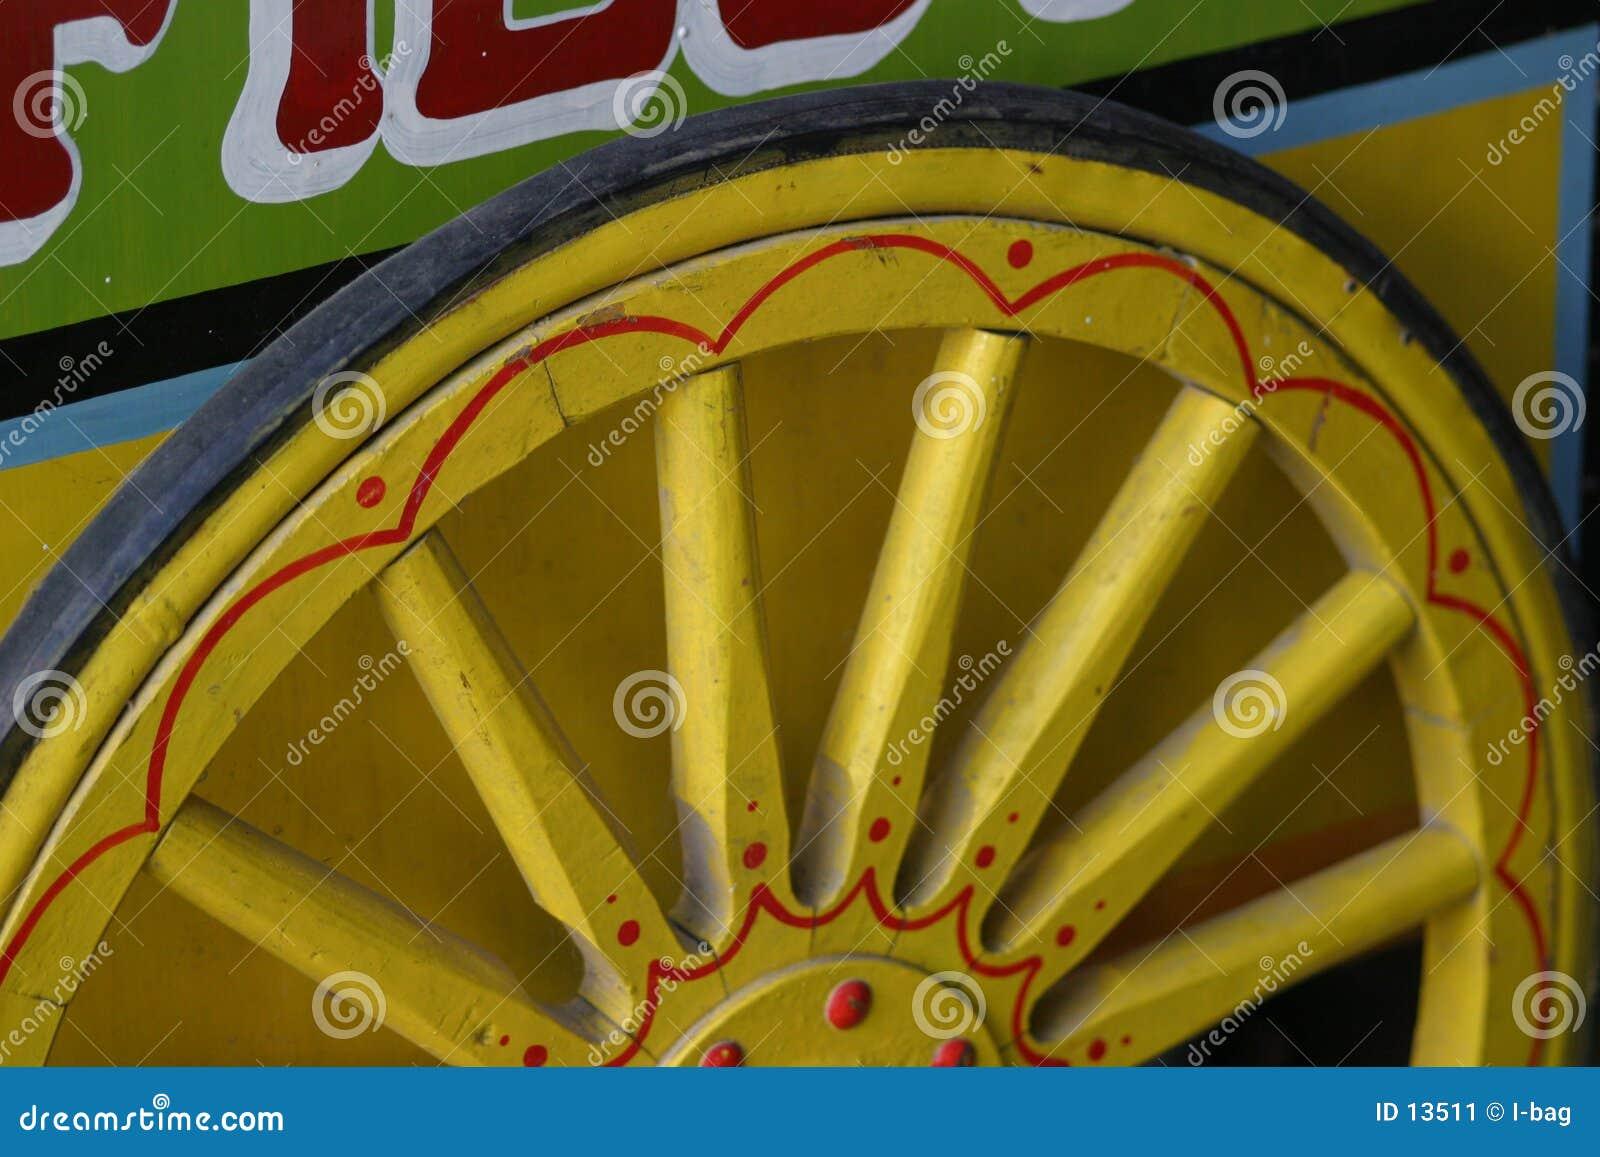 Yellow wooden wheel